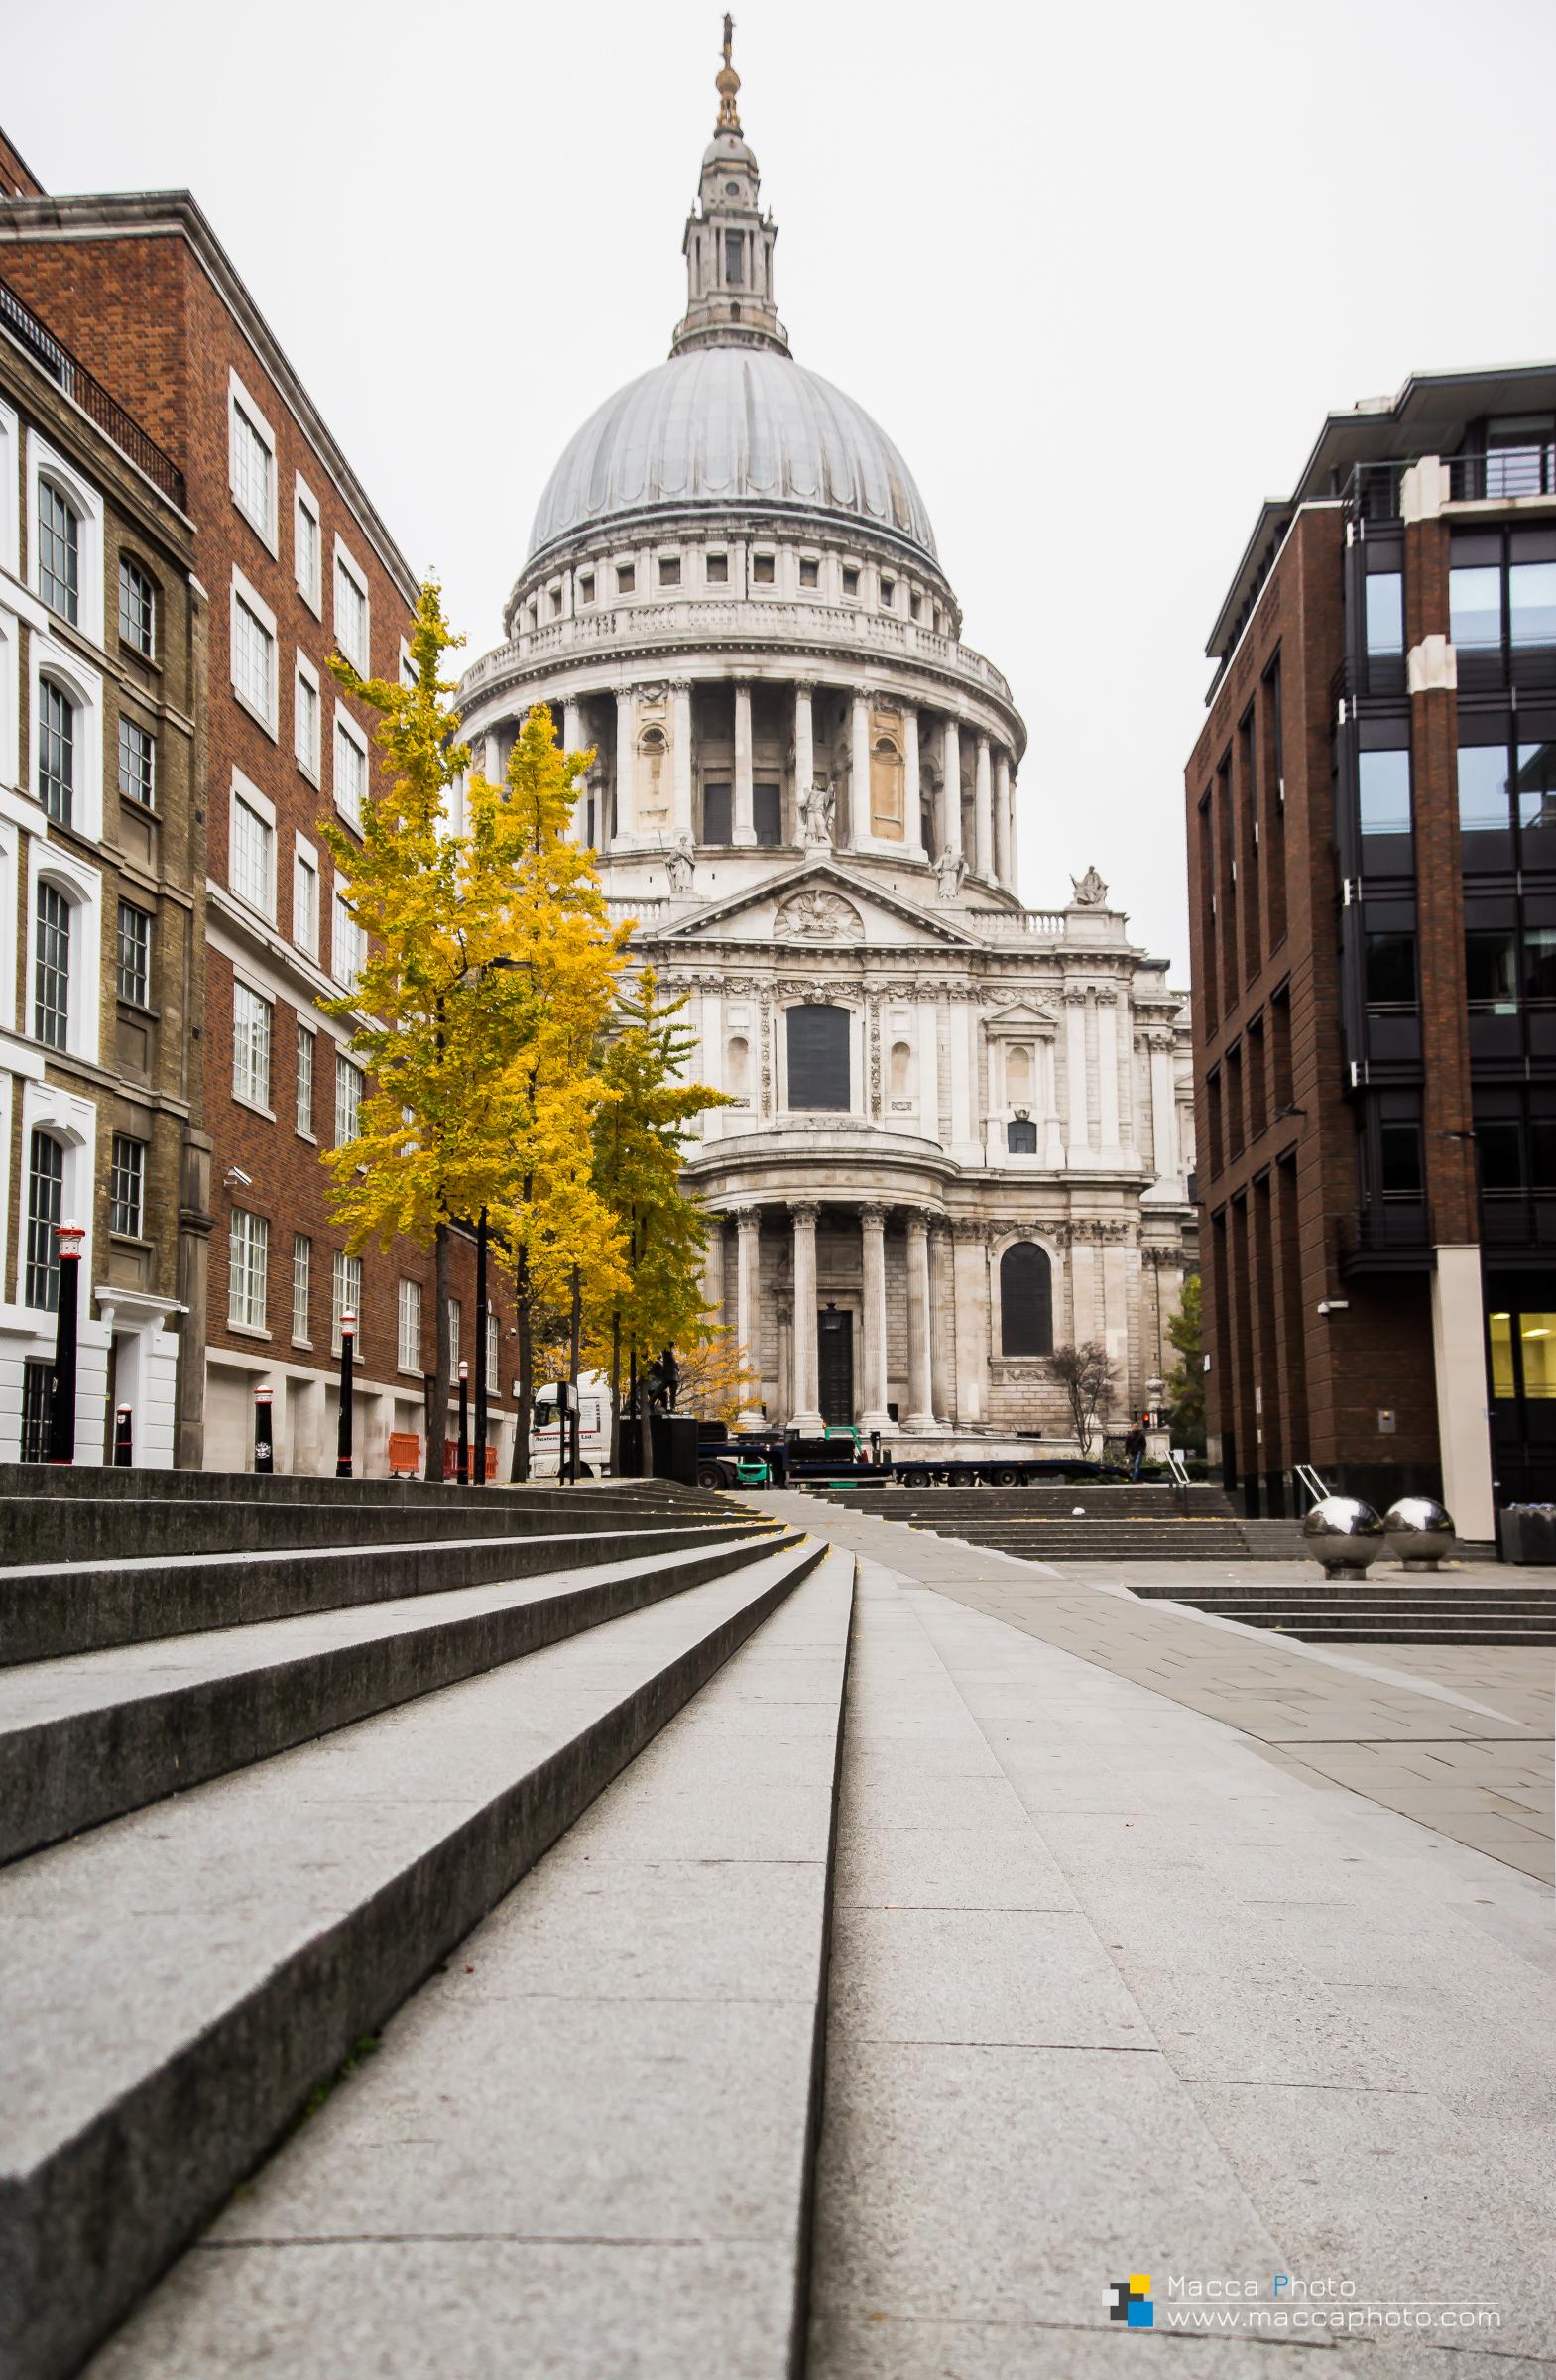 London - St Pauls 2